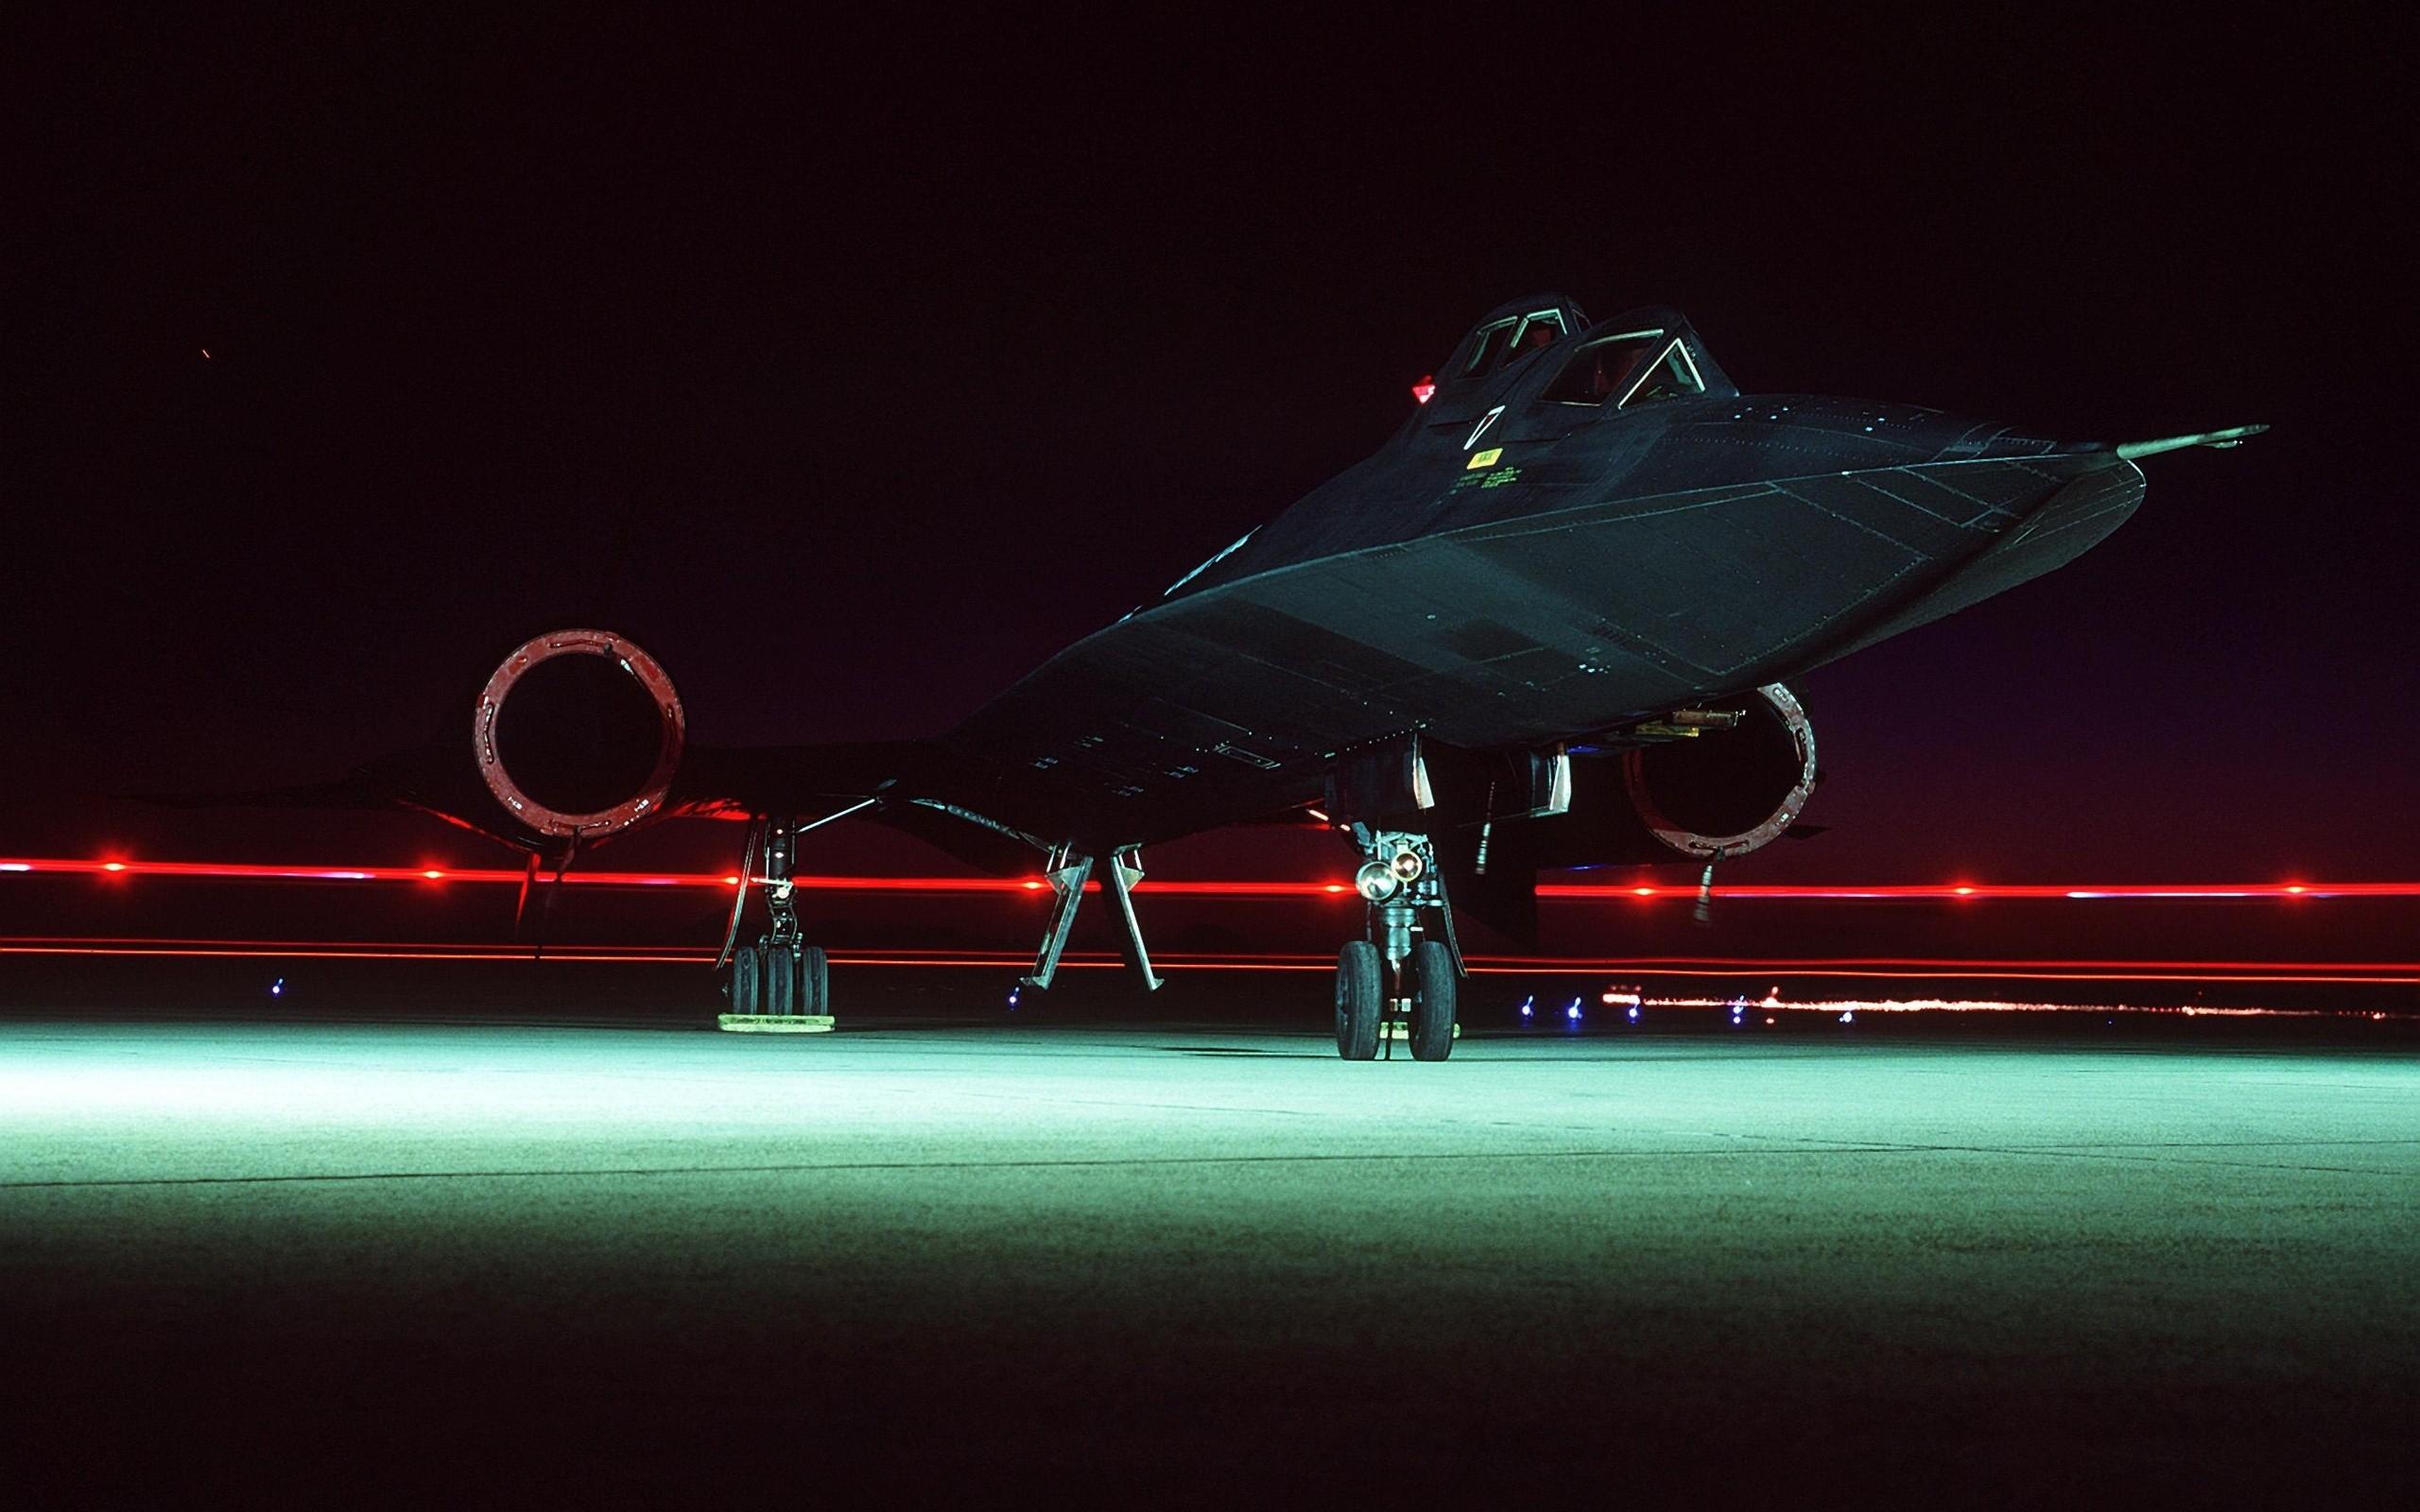 Fondos De Pantalla 2560x1600 Px Avión Lockheed Sr 71